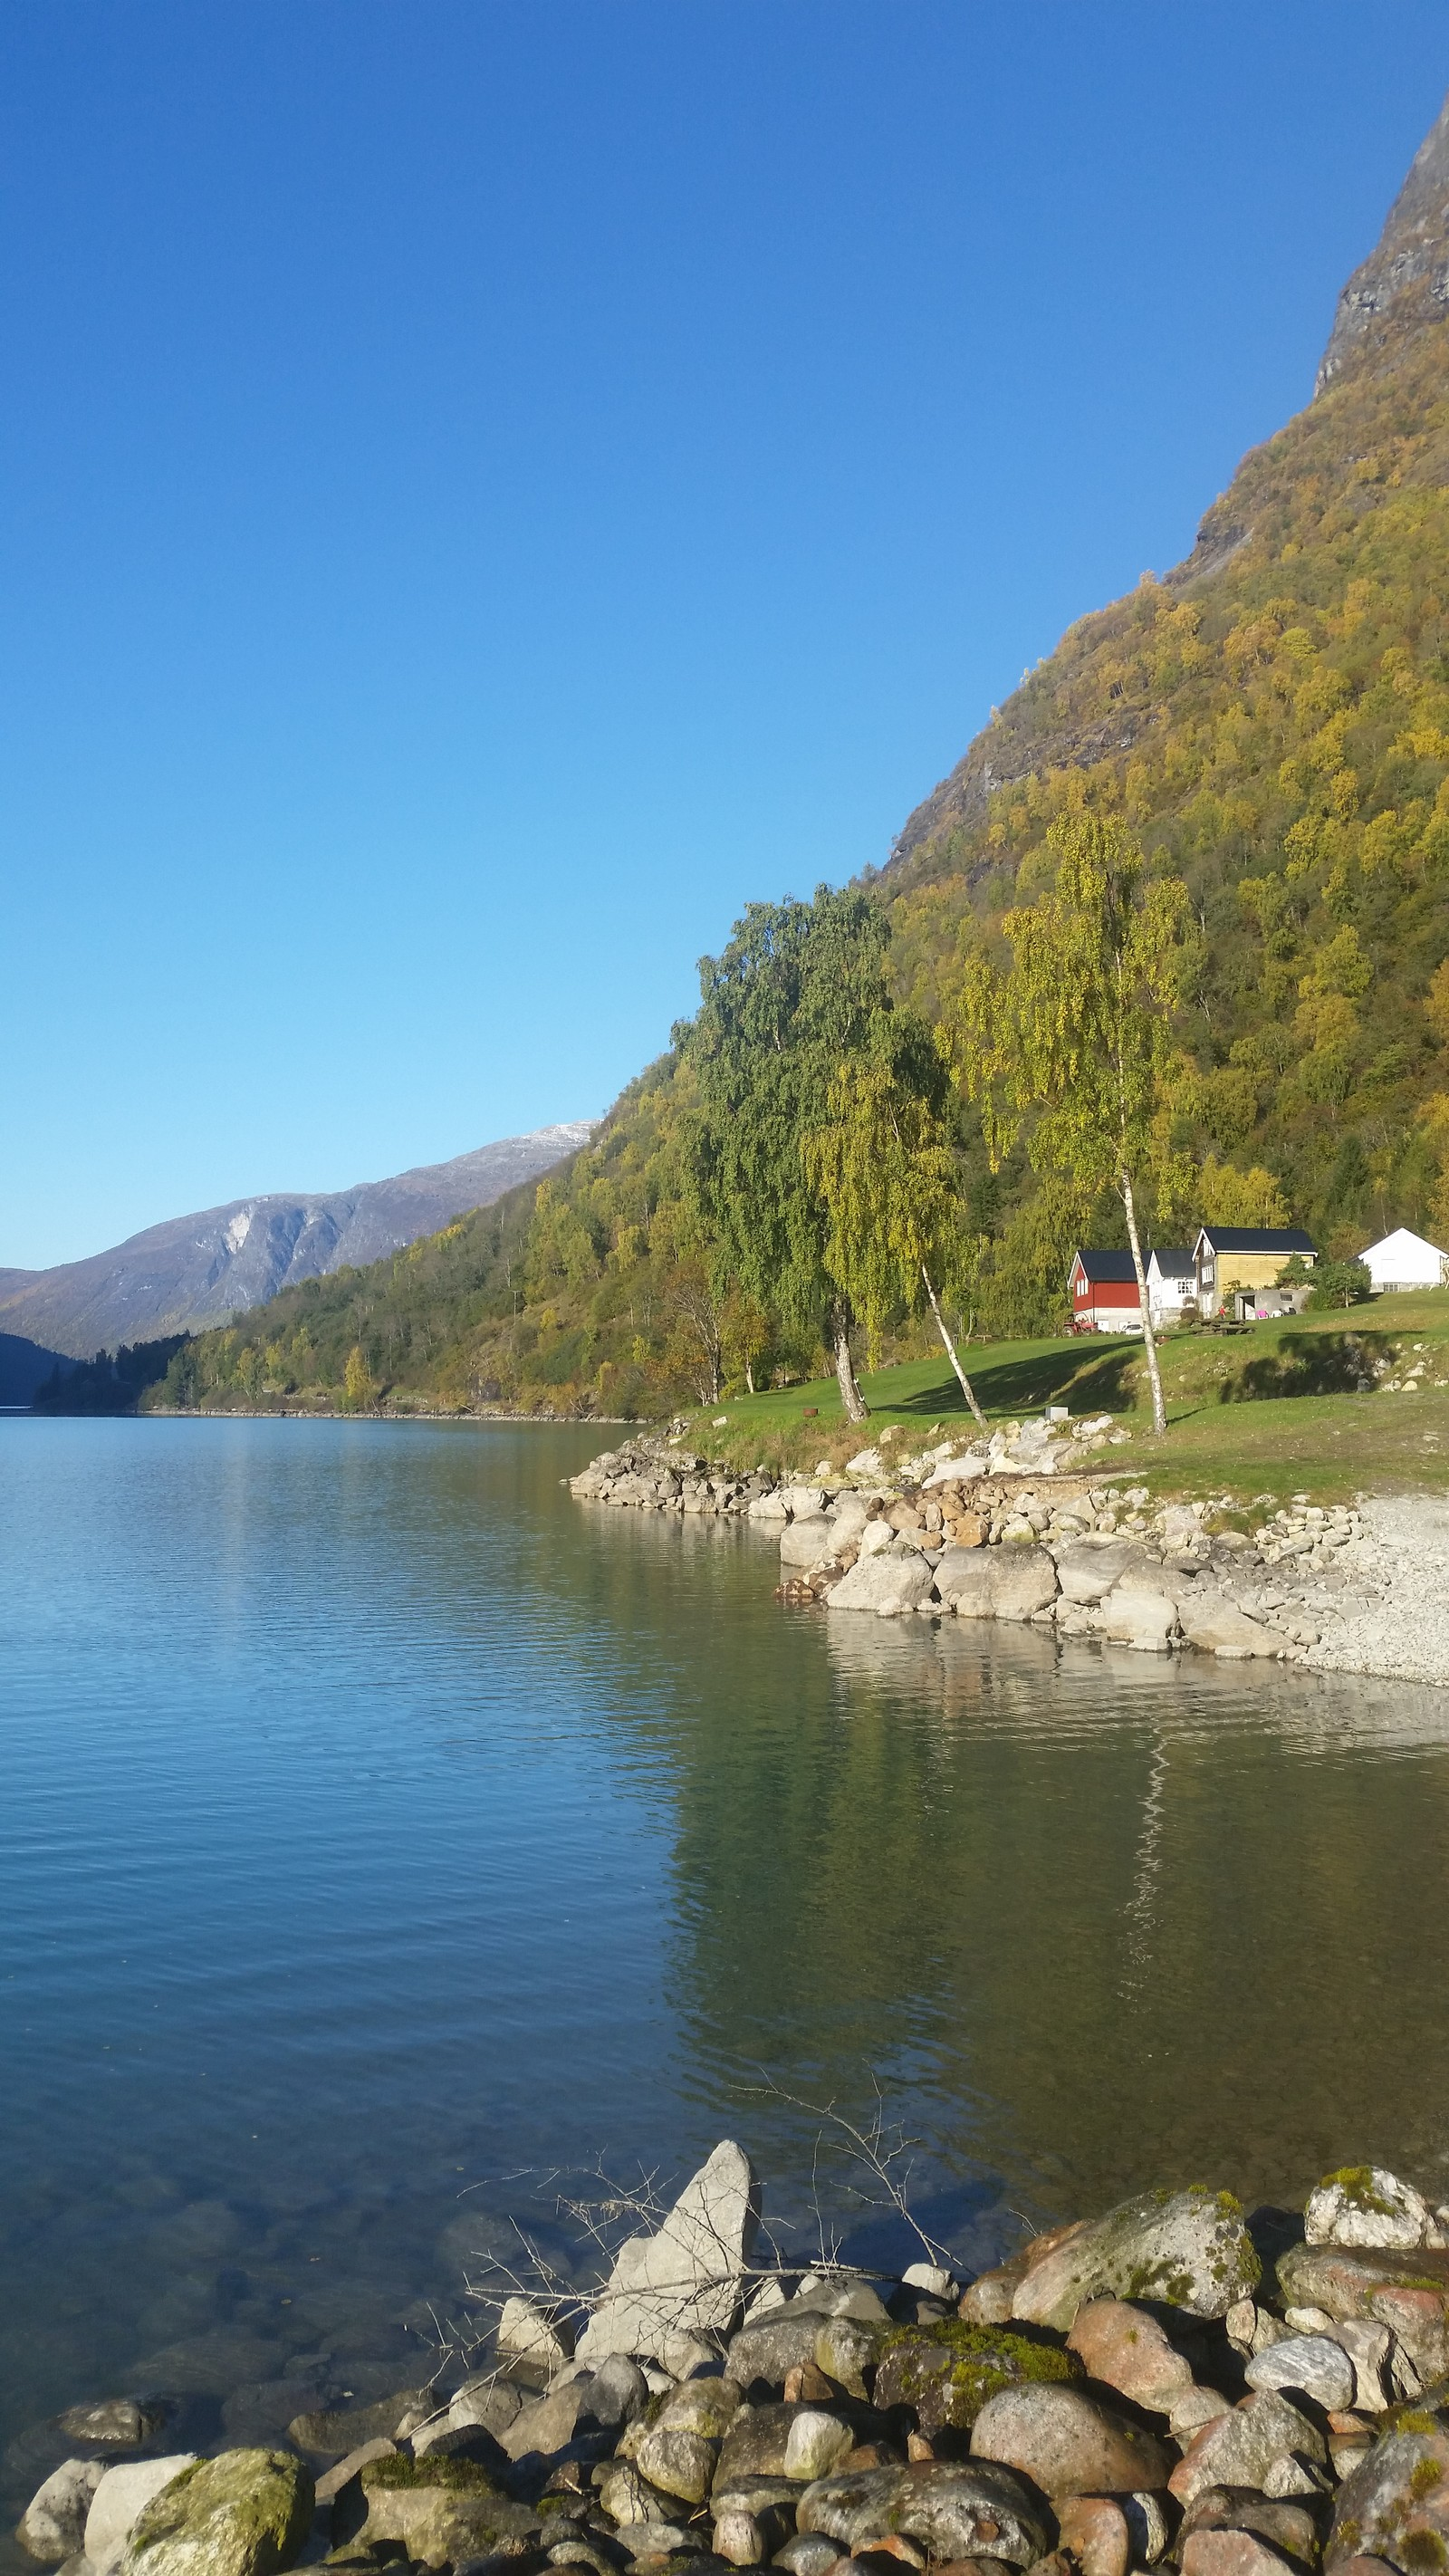 Ein fin haustdag på Helset i Lodalen 15. oktober.